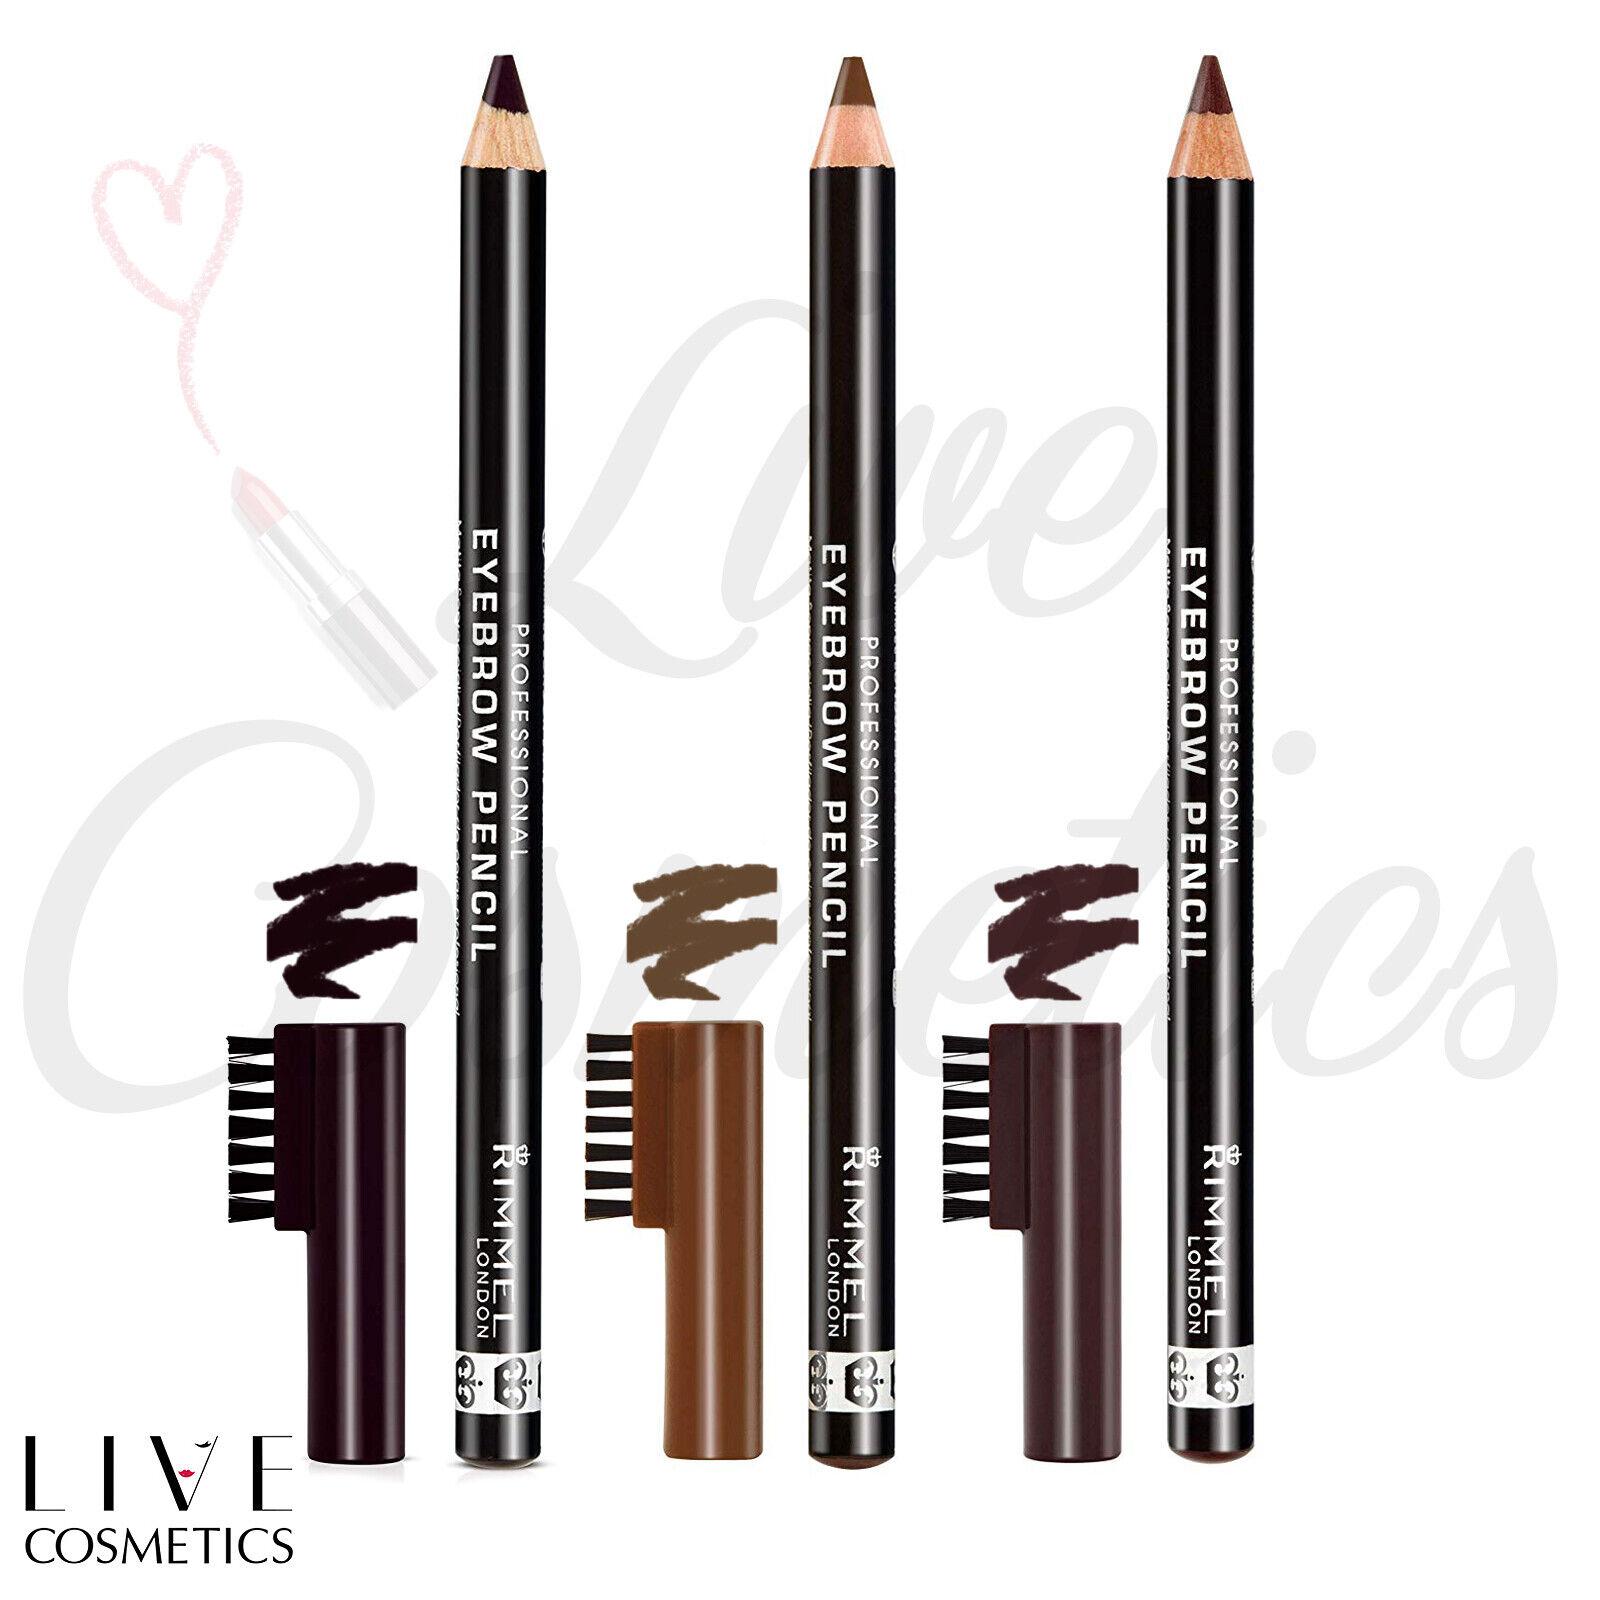 Rimmel Professional Eyebrow Pencil With Brush *DARK BROWN/ HAZEL/ BLACK BROWN* £2.14 @ eBay